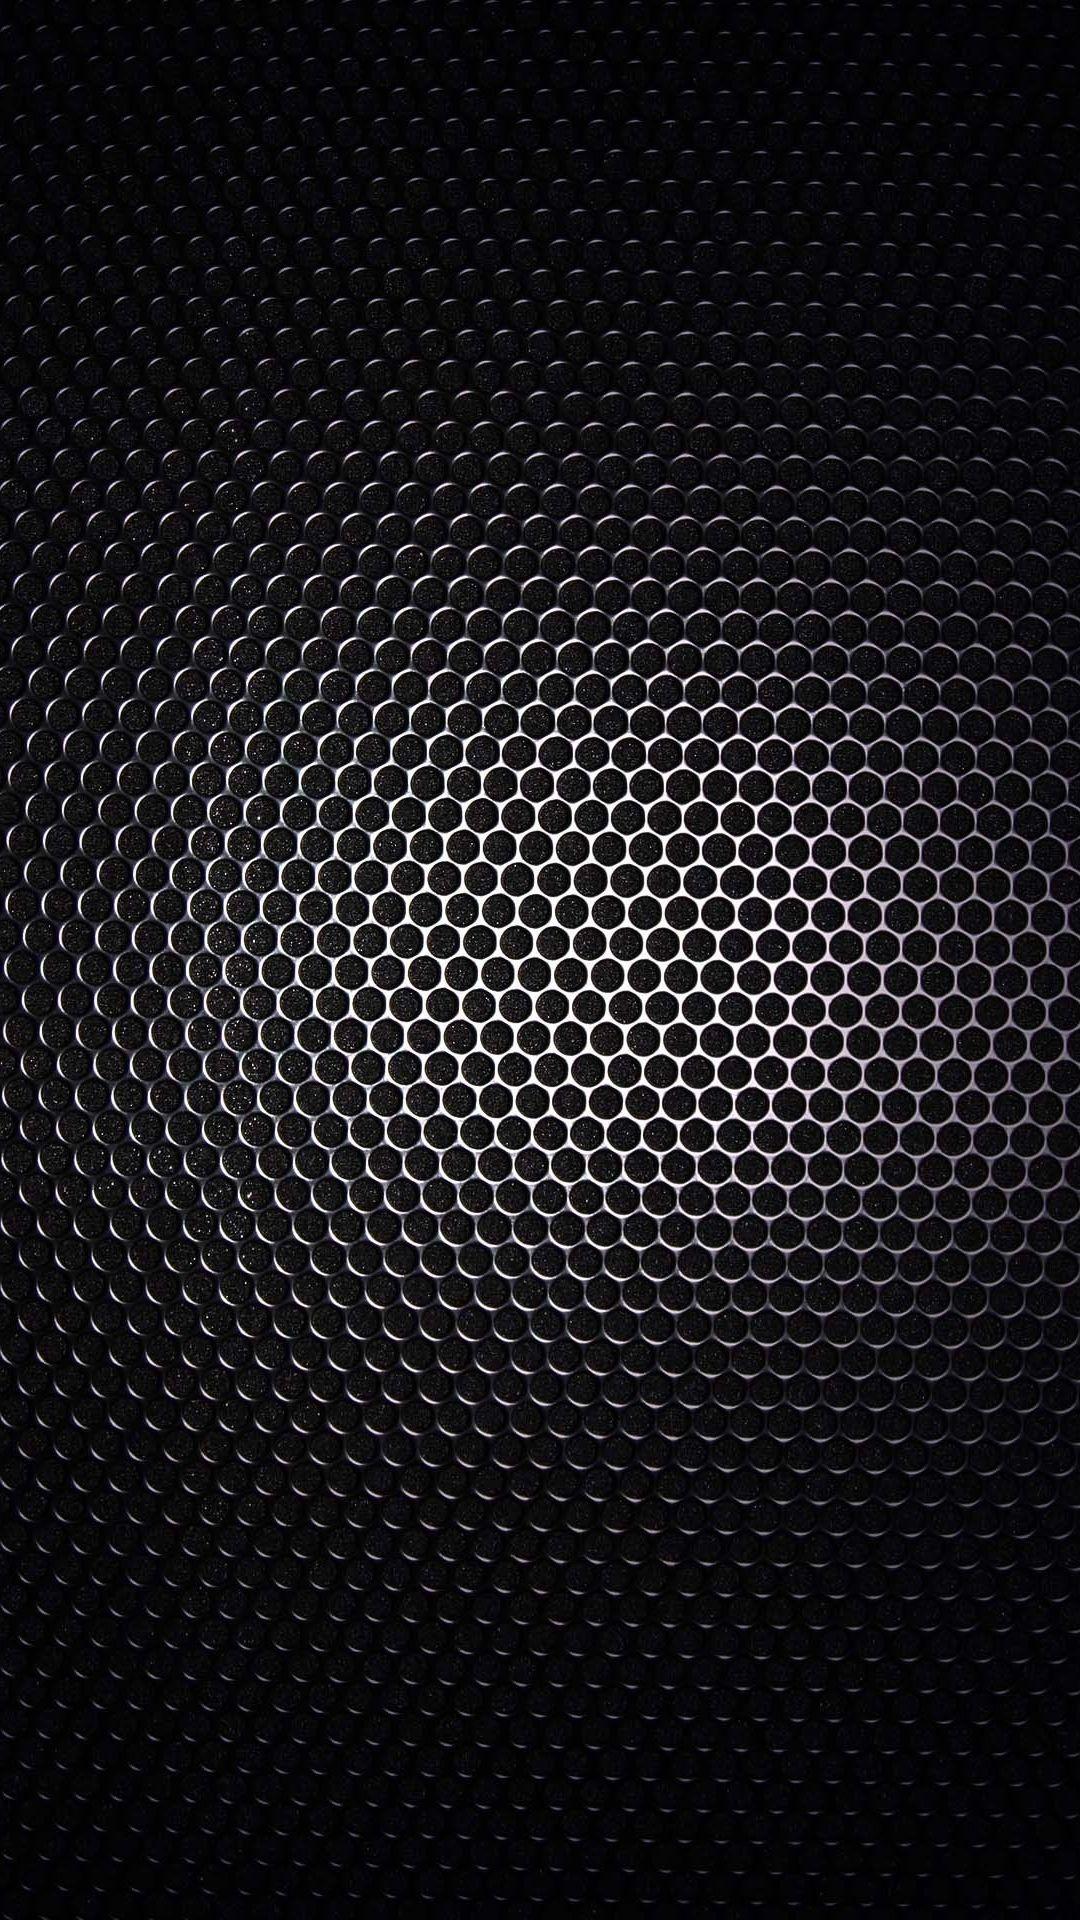 Wallpaper Hd Black Phone Wallpaper Dark Wallpaper Black Hd Wallpaper